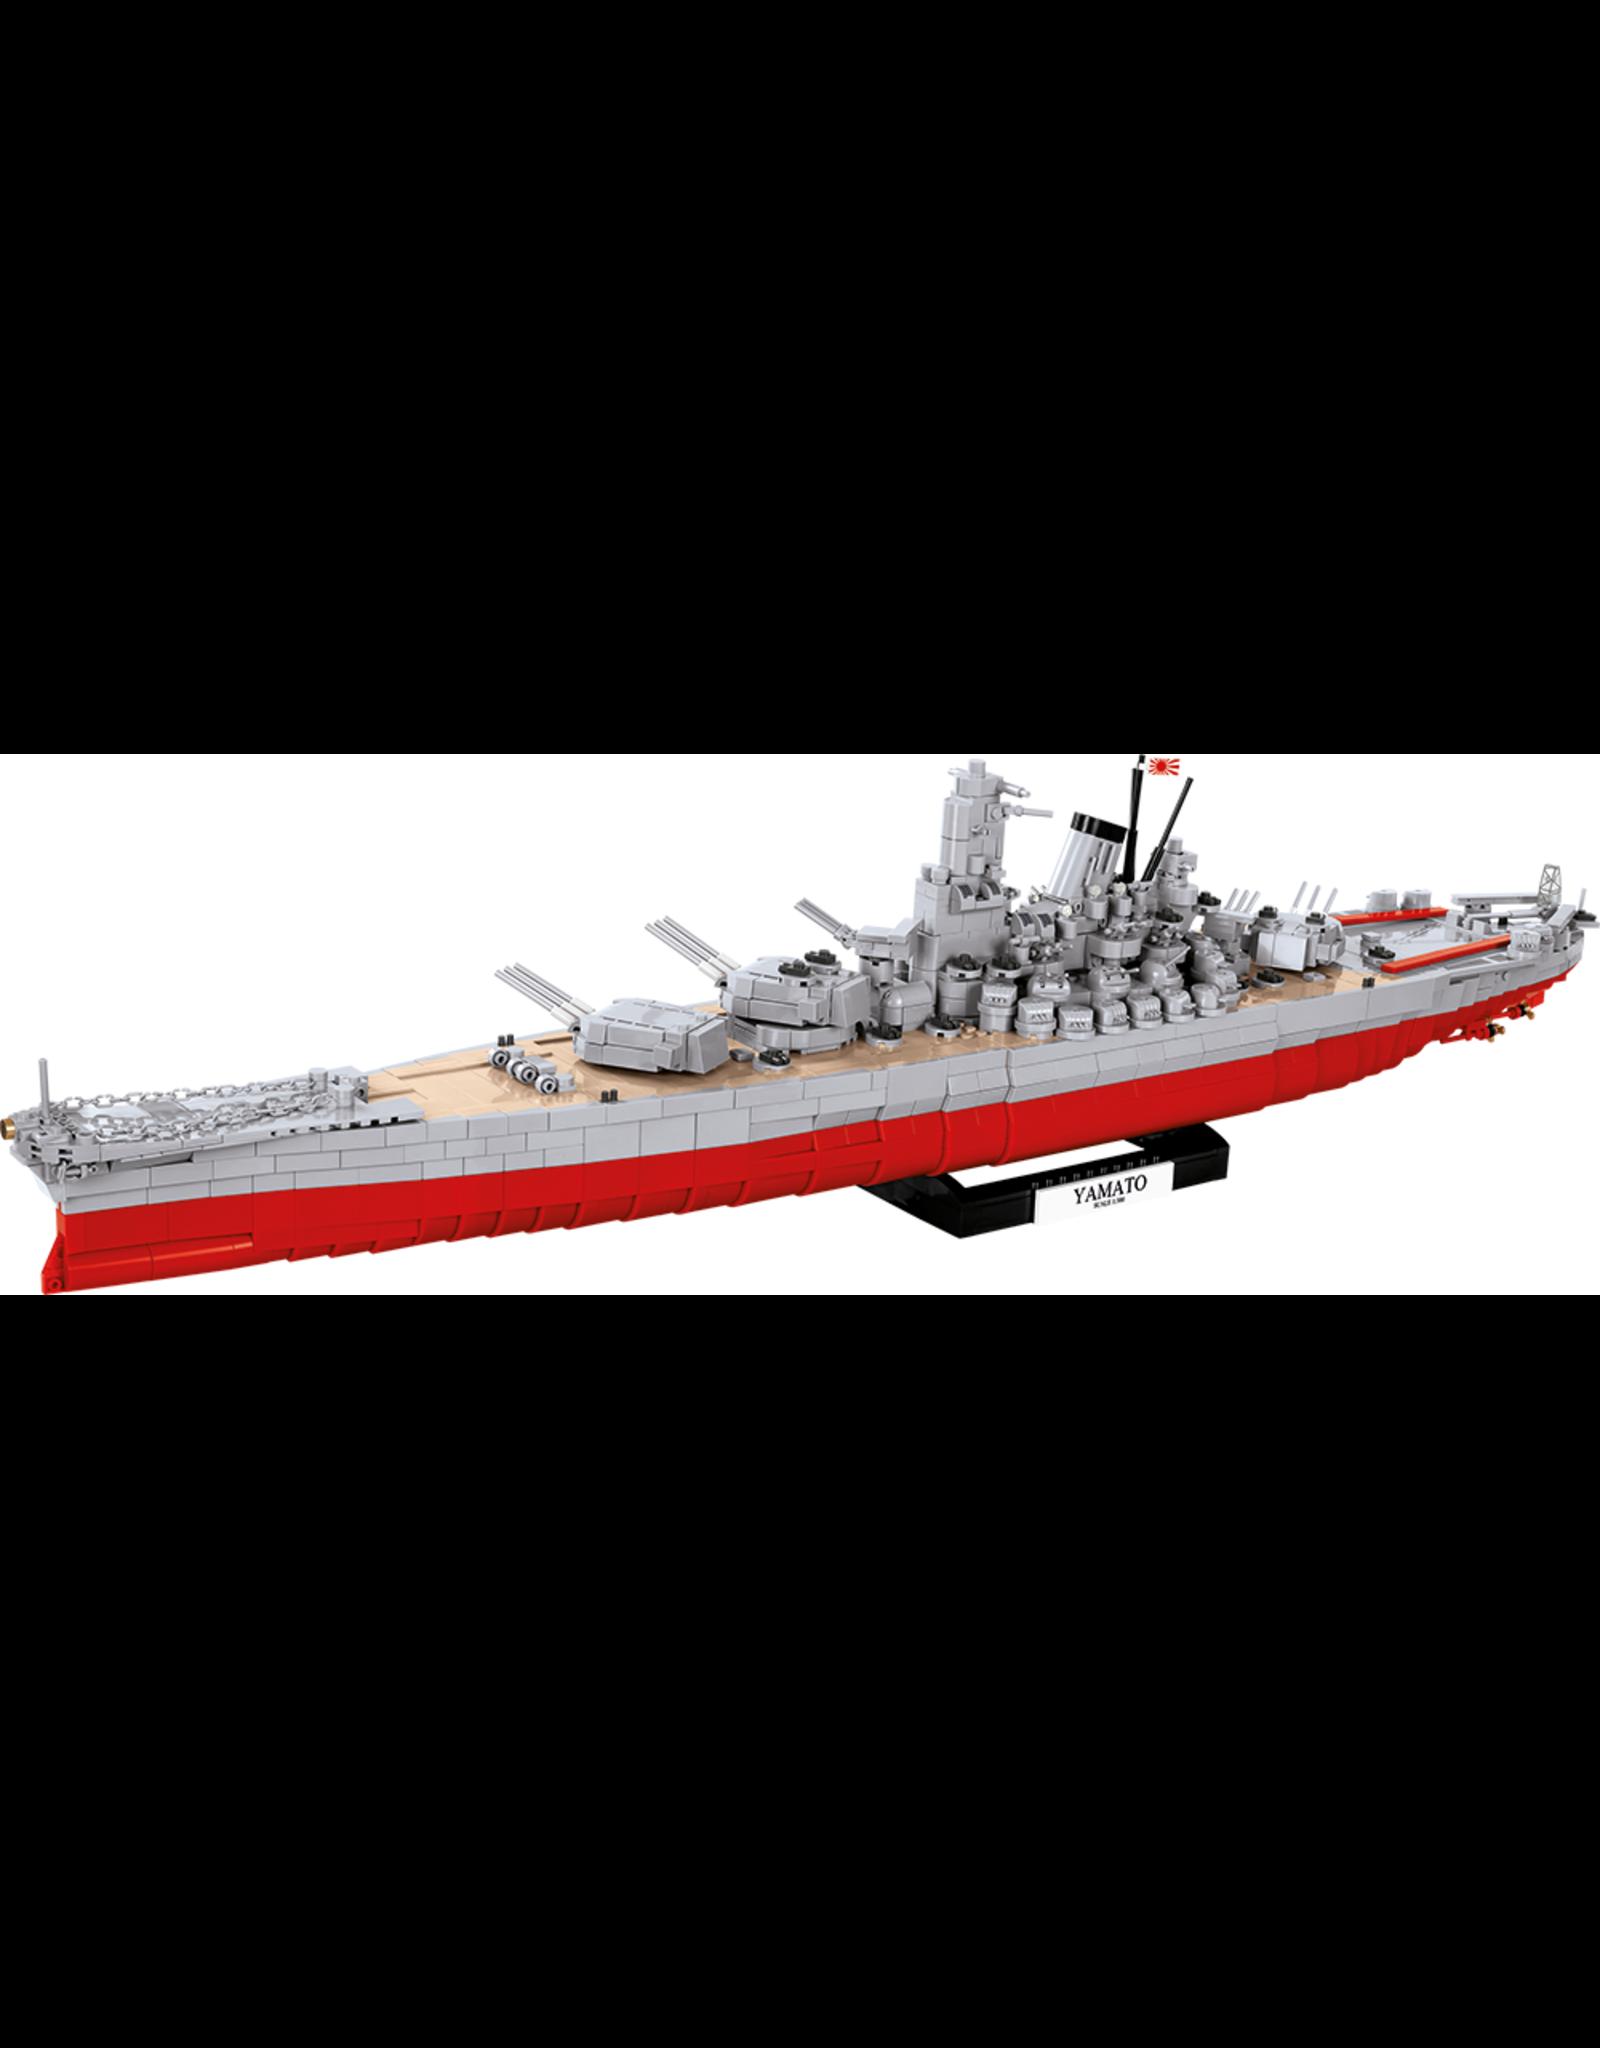 COBI COBI World of Warships 3083 Battleship Yamato